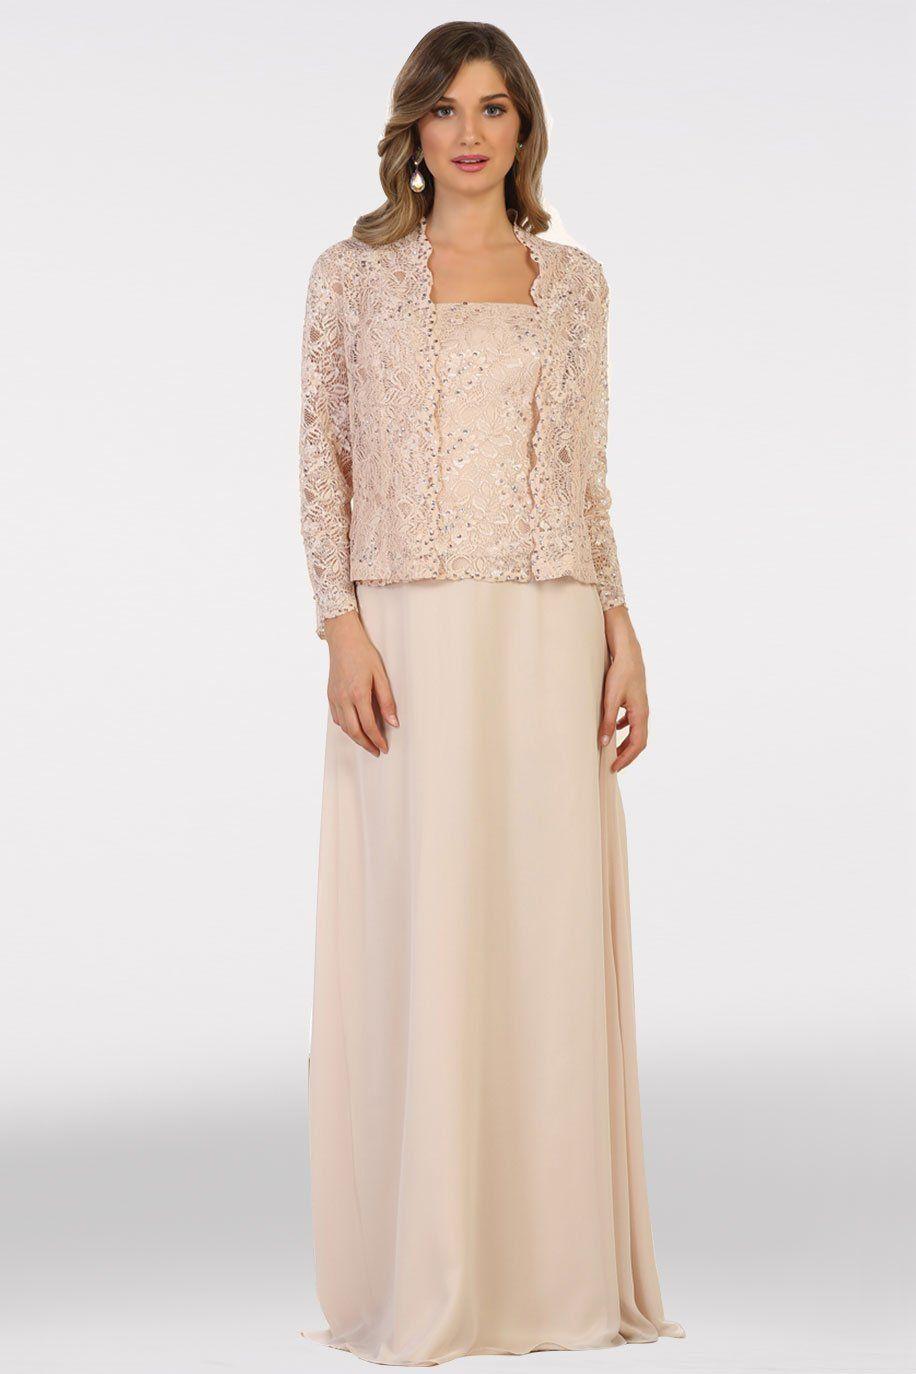 3c175539fdf Evening Dresses With Jackets Uk